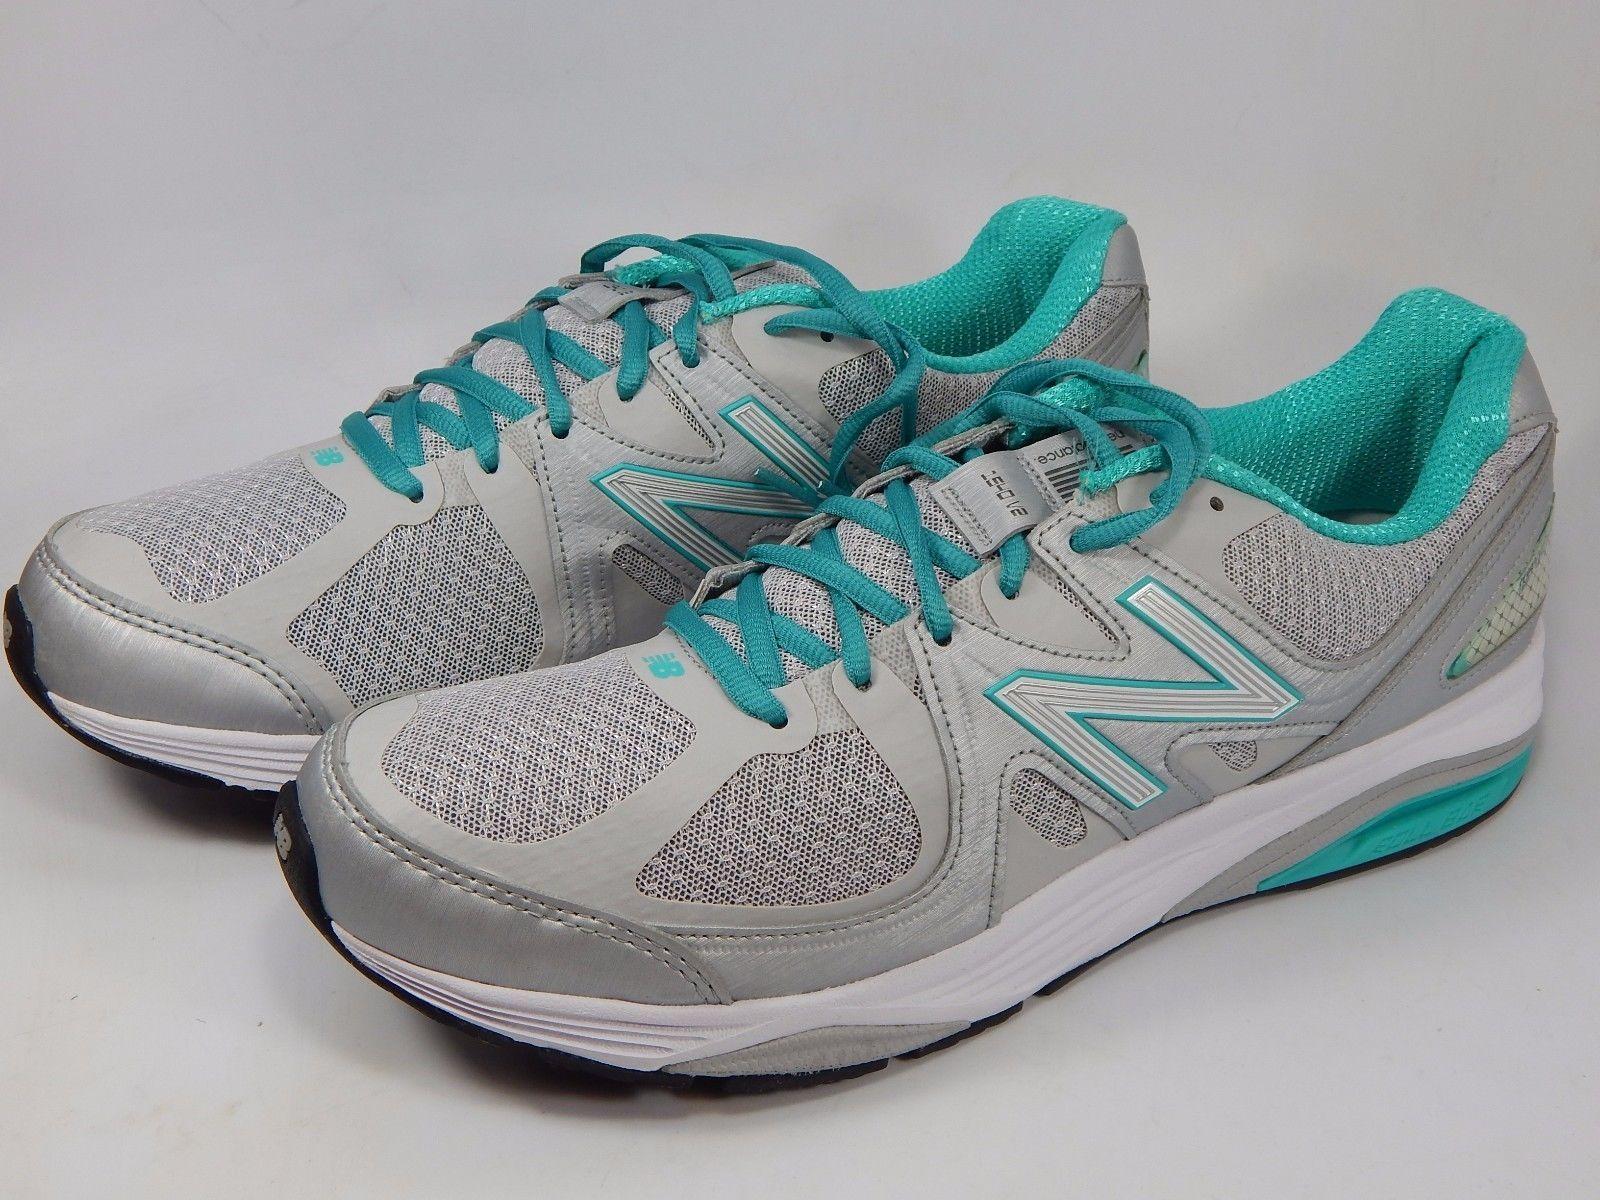 nb shoes 1540 v2 nb sport shoes for women